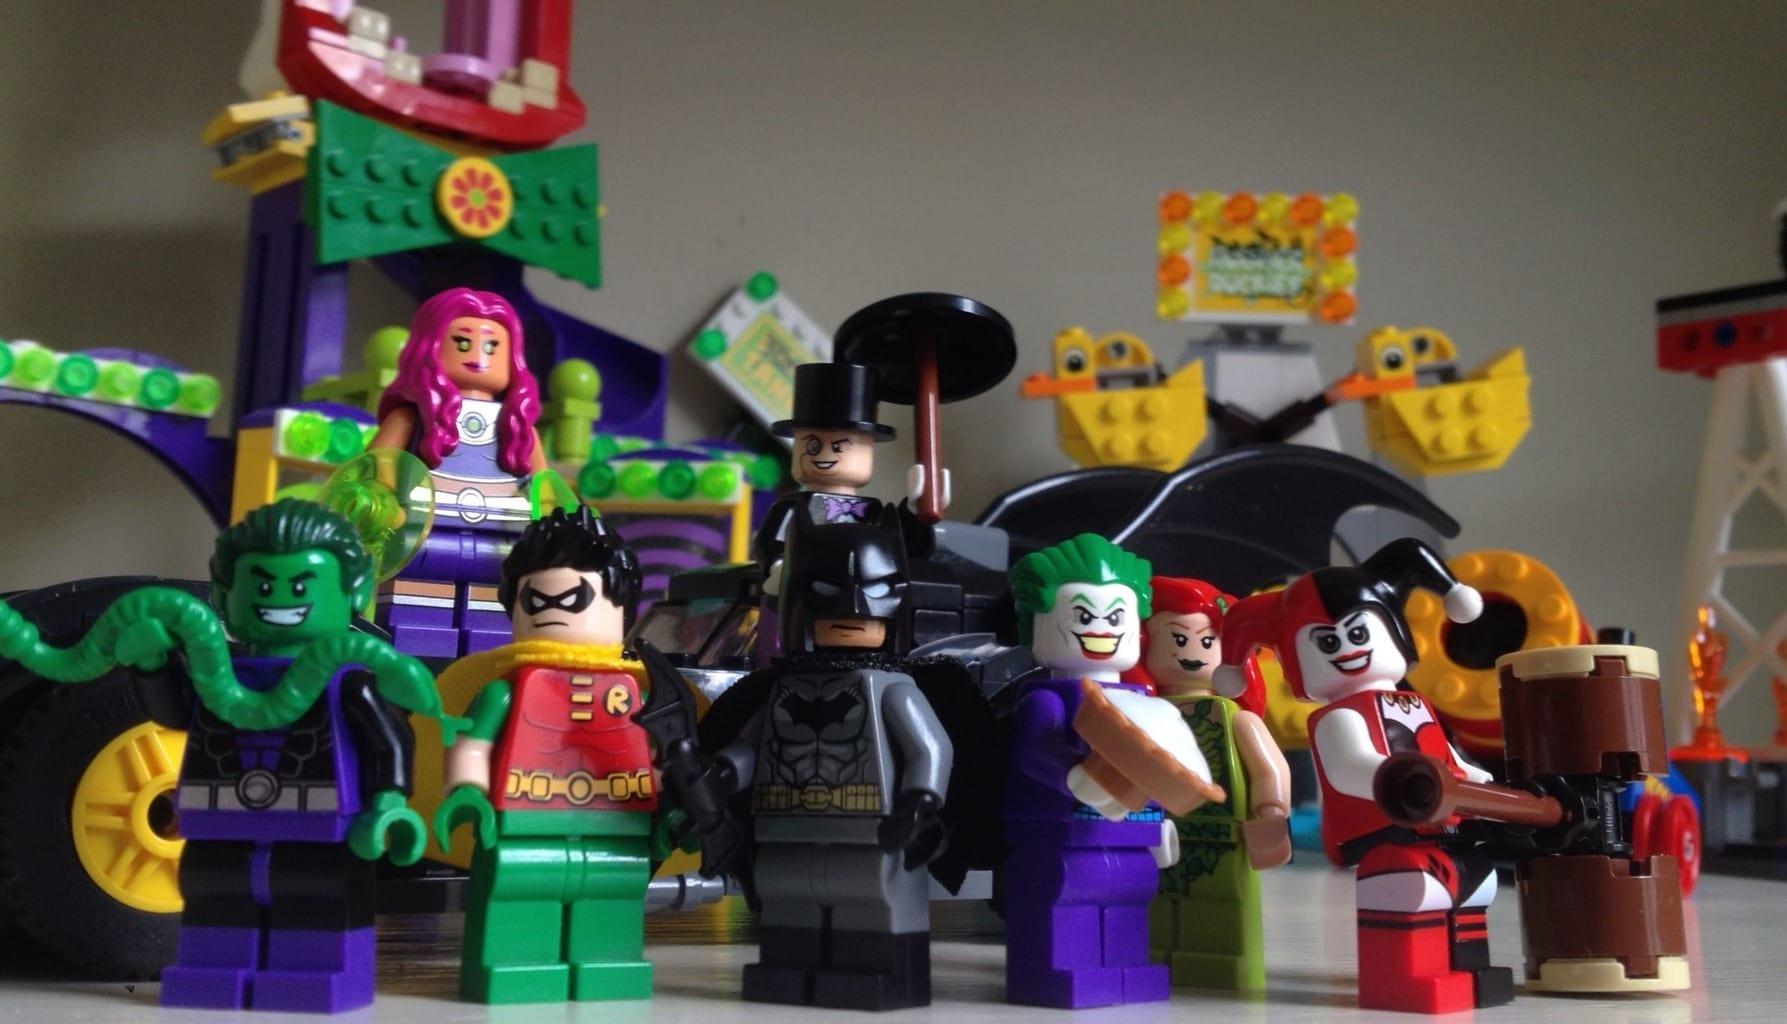 Lego DC Super Heroes Batman Brand New Starfire Minifigure 76035 Jokerland